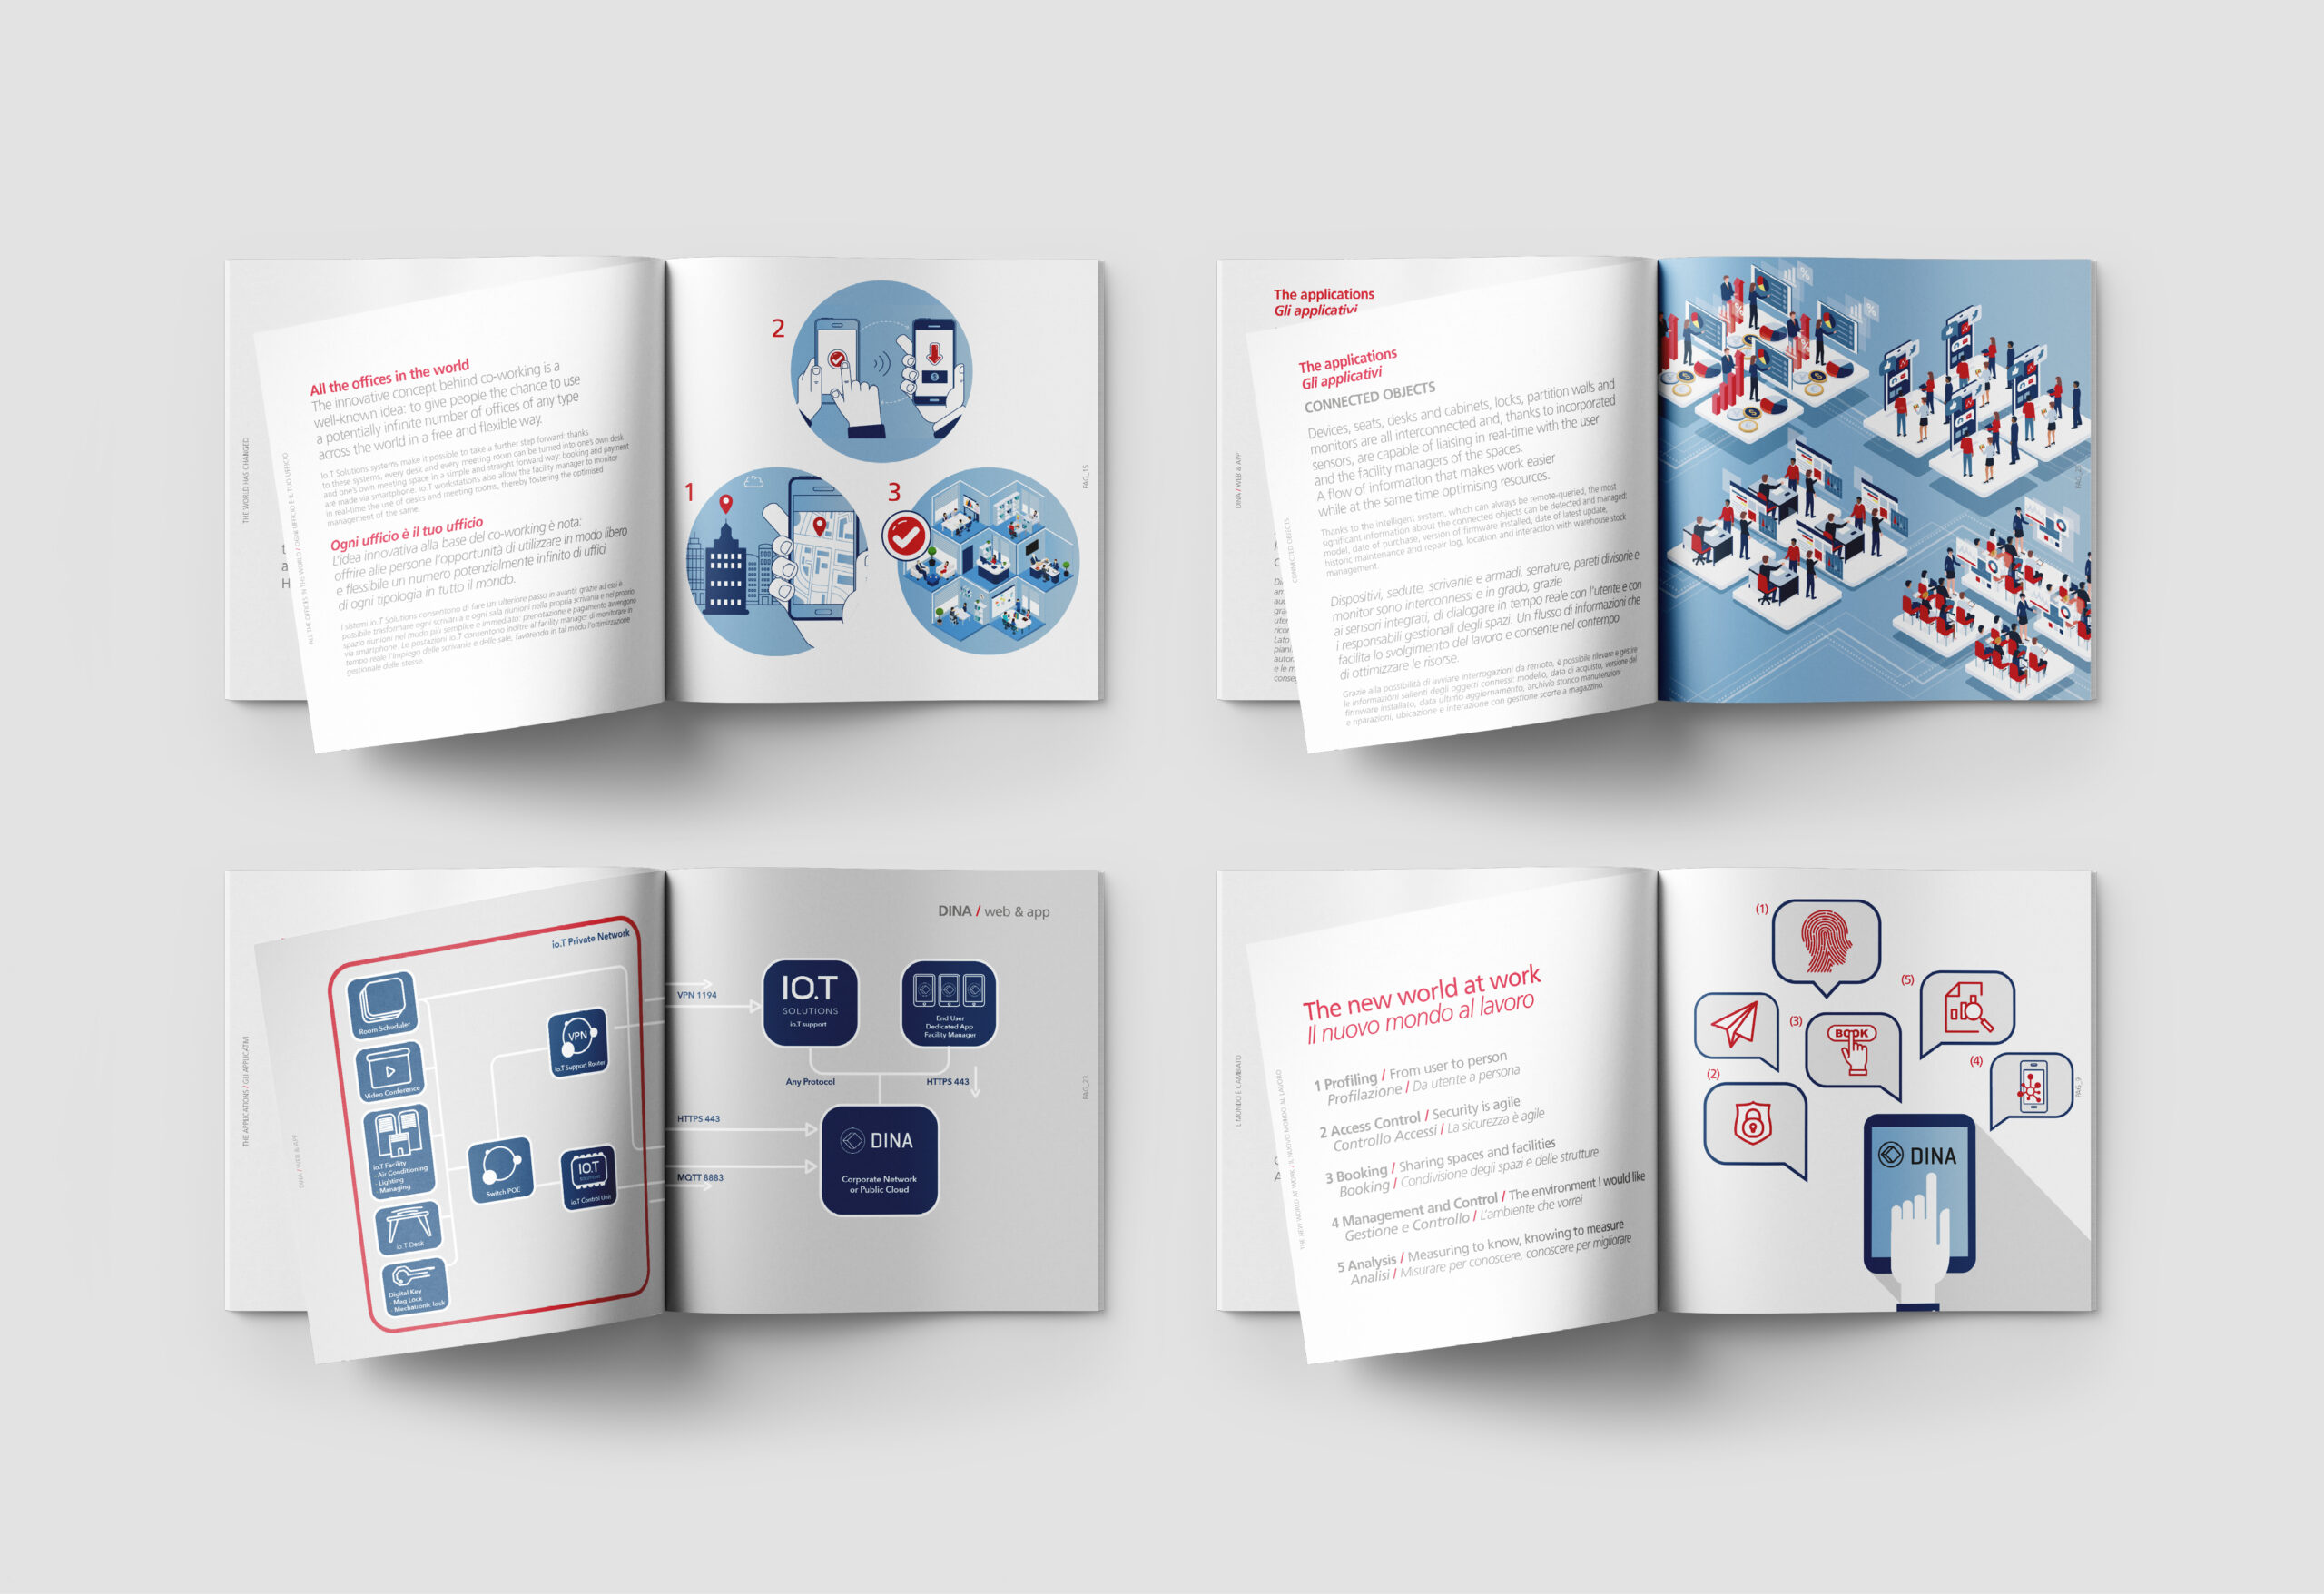 Romanoassociati_Behance_Iot_brochure